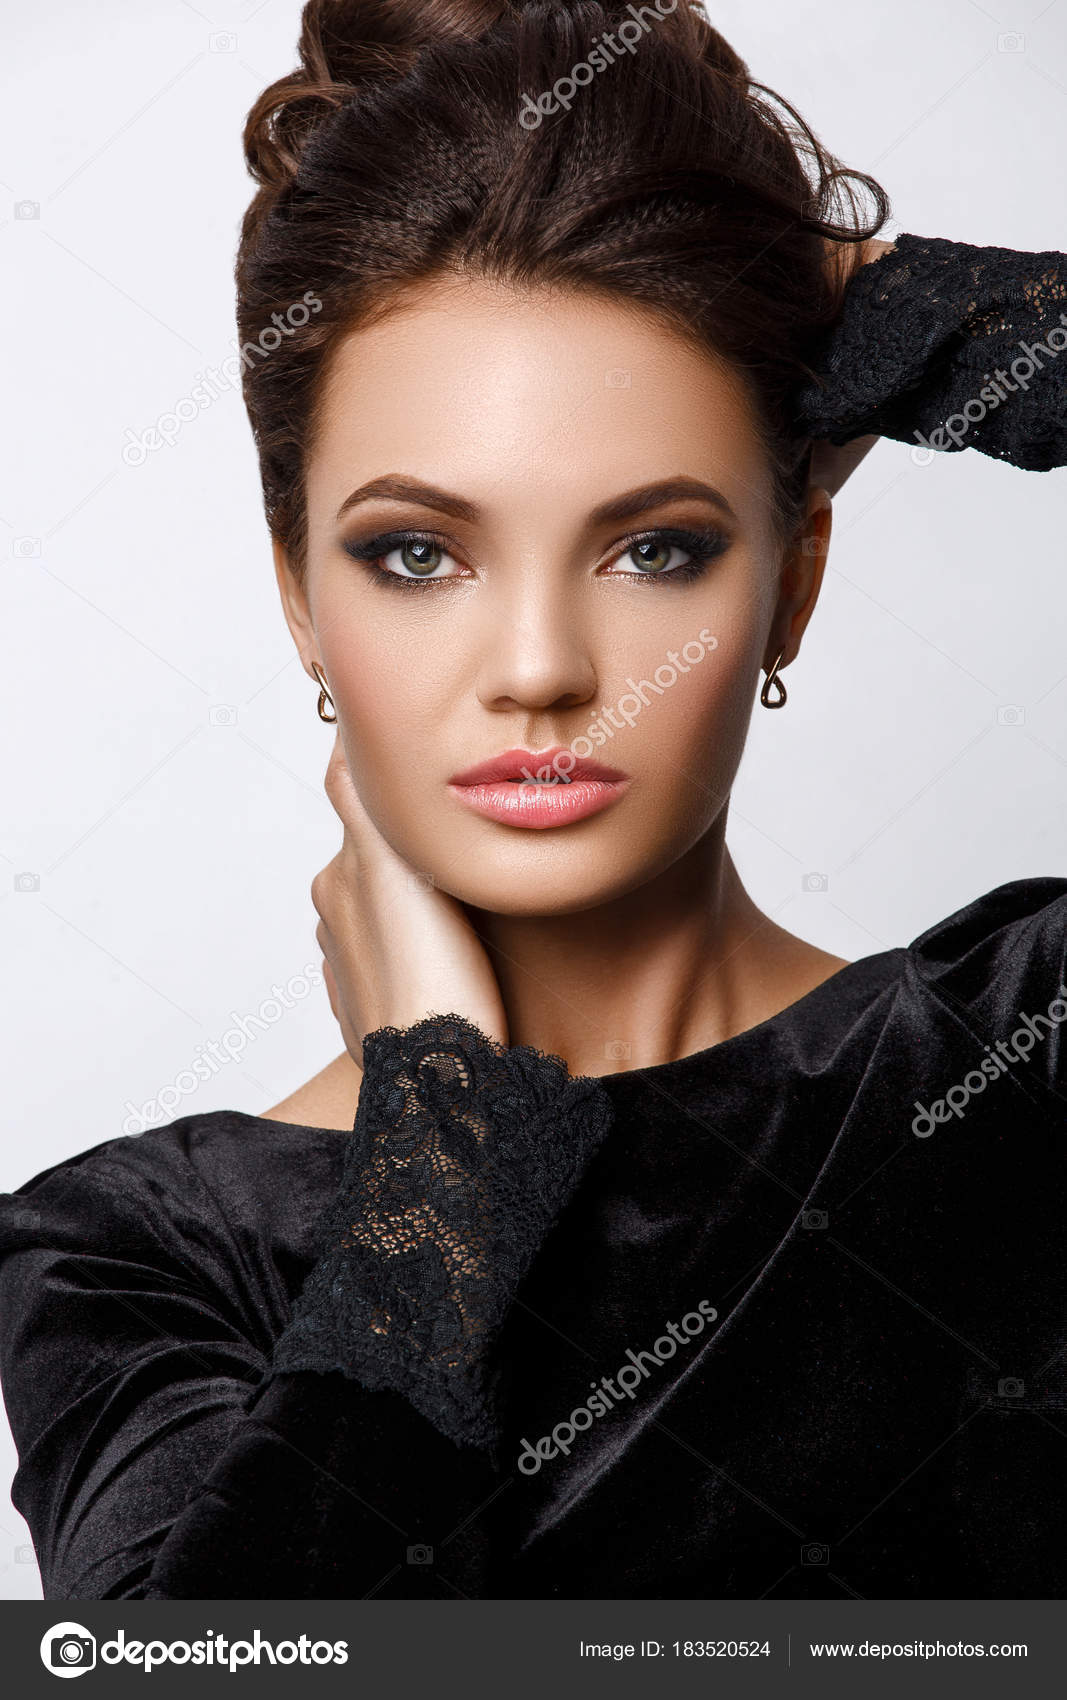 Retrato Estudio Hermosa Atractiva Mujer Joven Con Maquillaje Noche